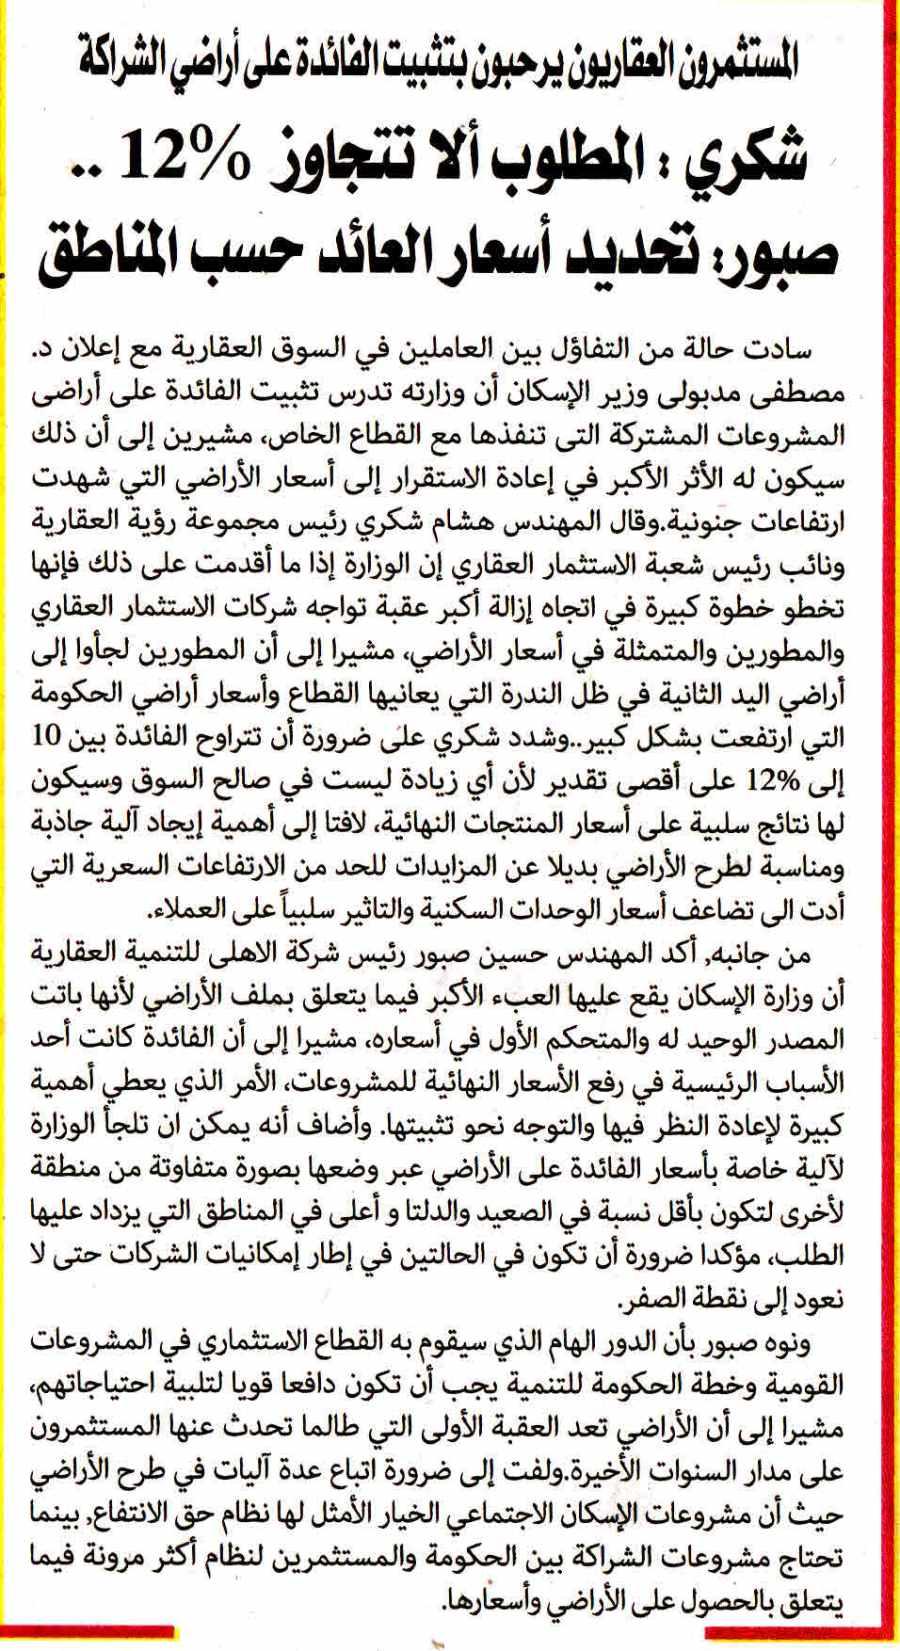 Al Alam Al Youm 15 Nov P.1.jpg